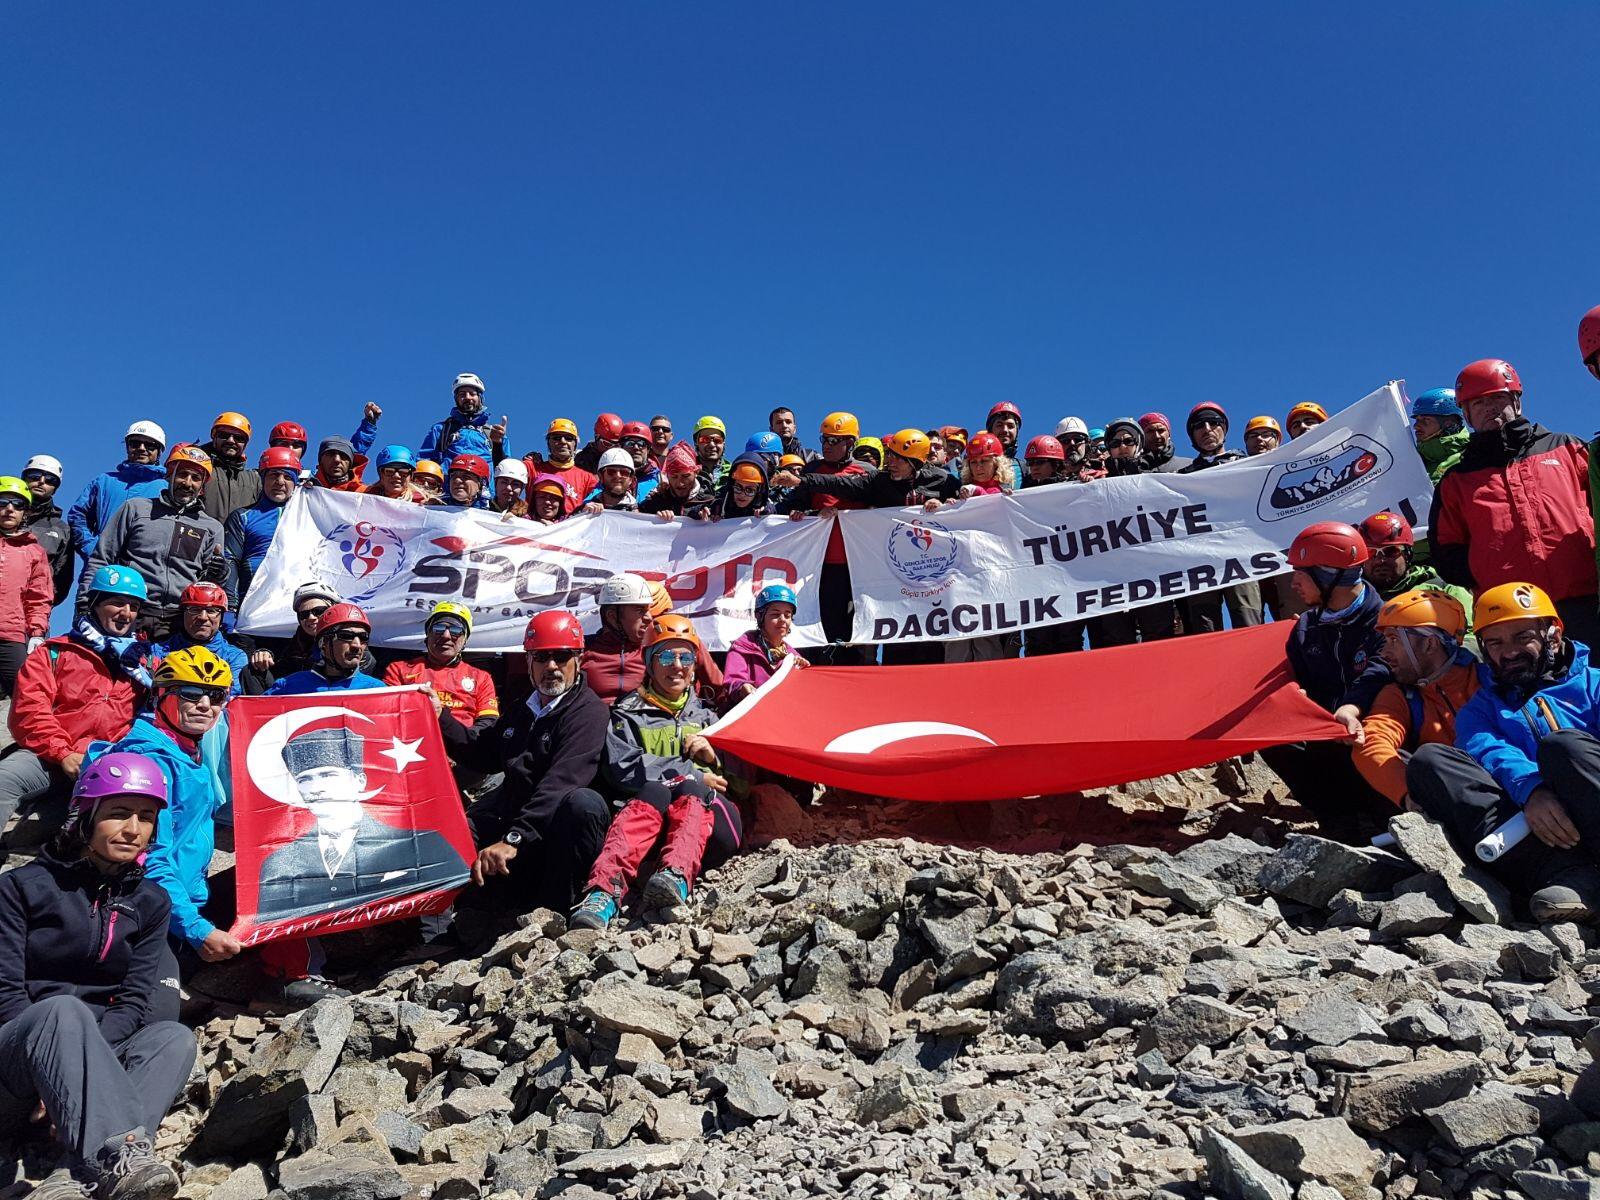 30 Ağustos Zafer Bayramı Kaçkar Dağı Tırmanışı tamamlandı.